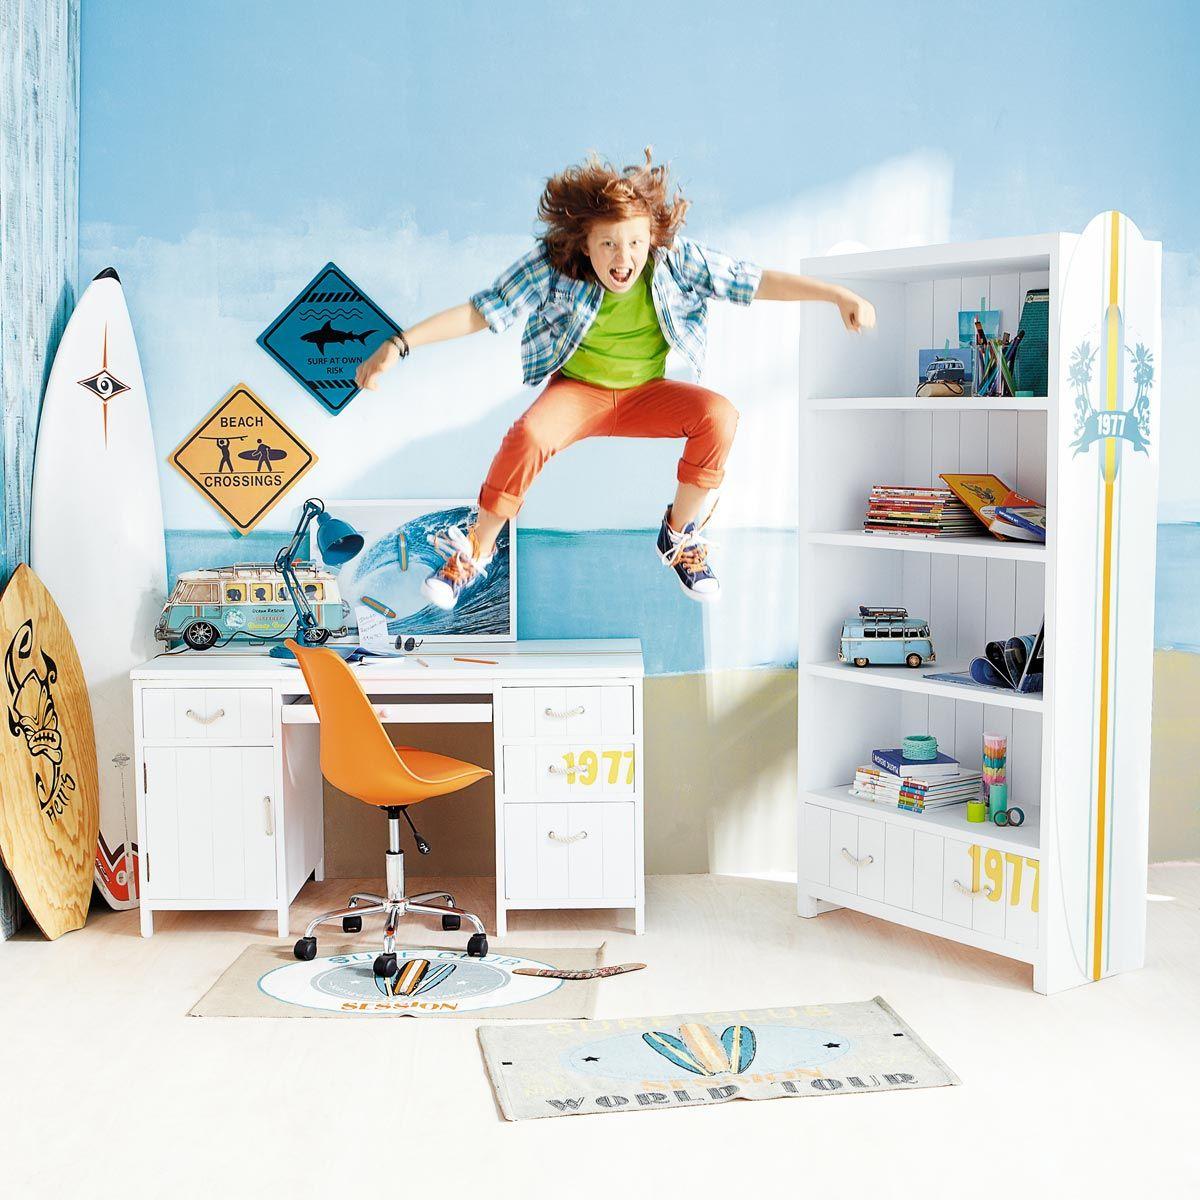 Bureau blanc Surf  Deco chambre, Déco chambre ado garçon, Deco